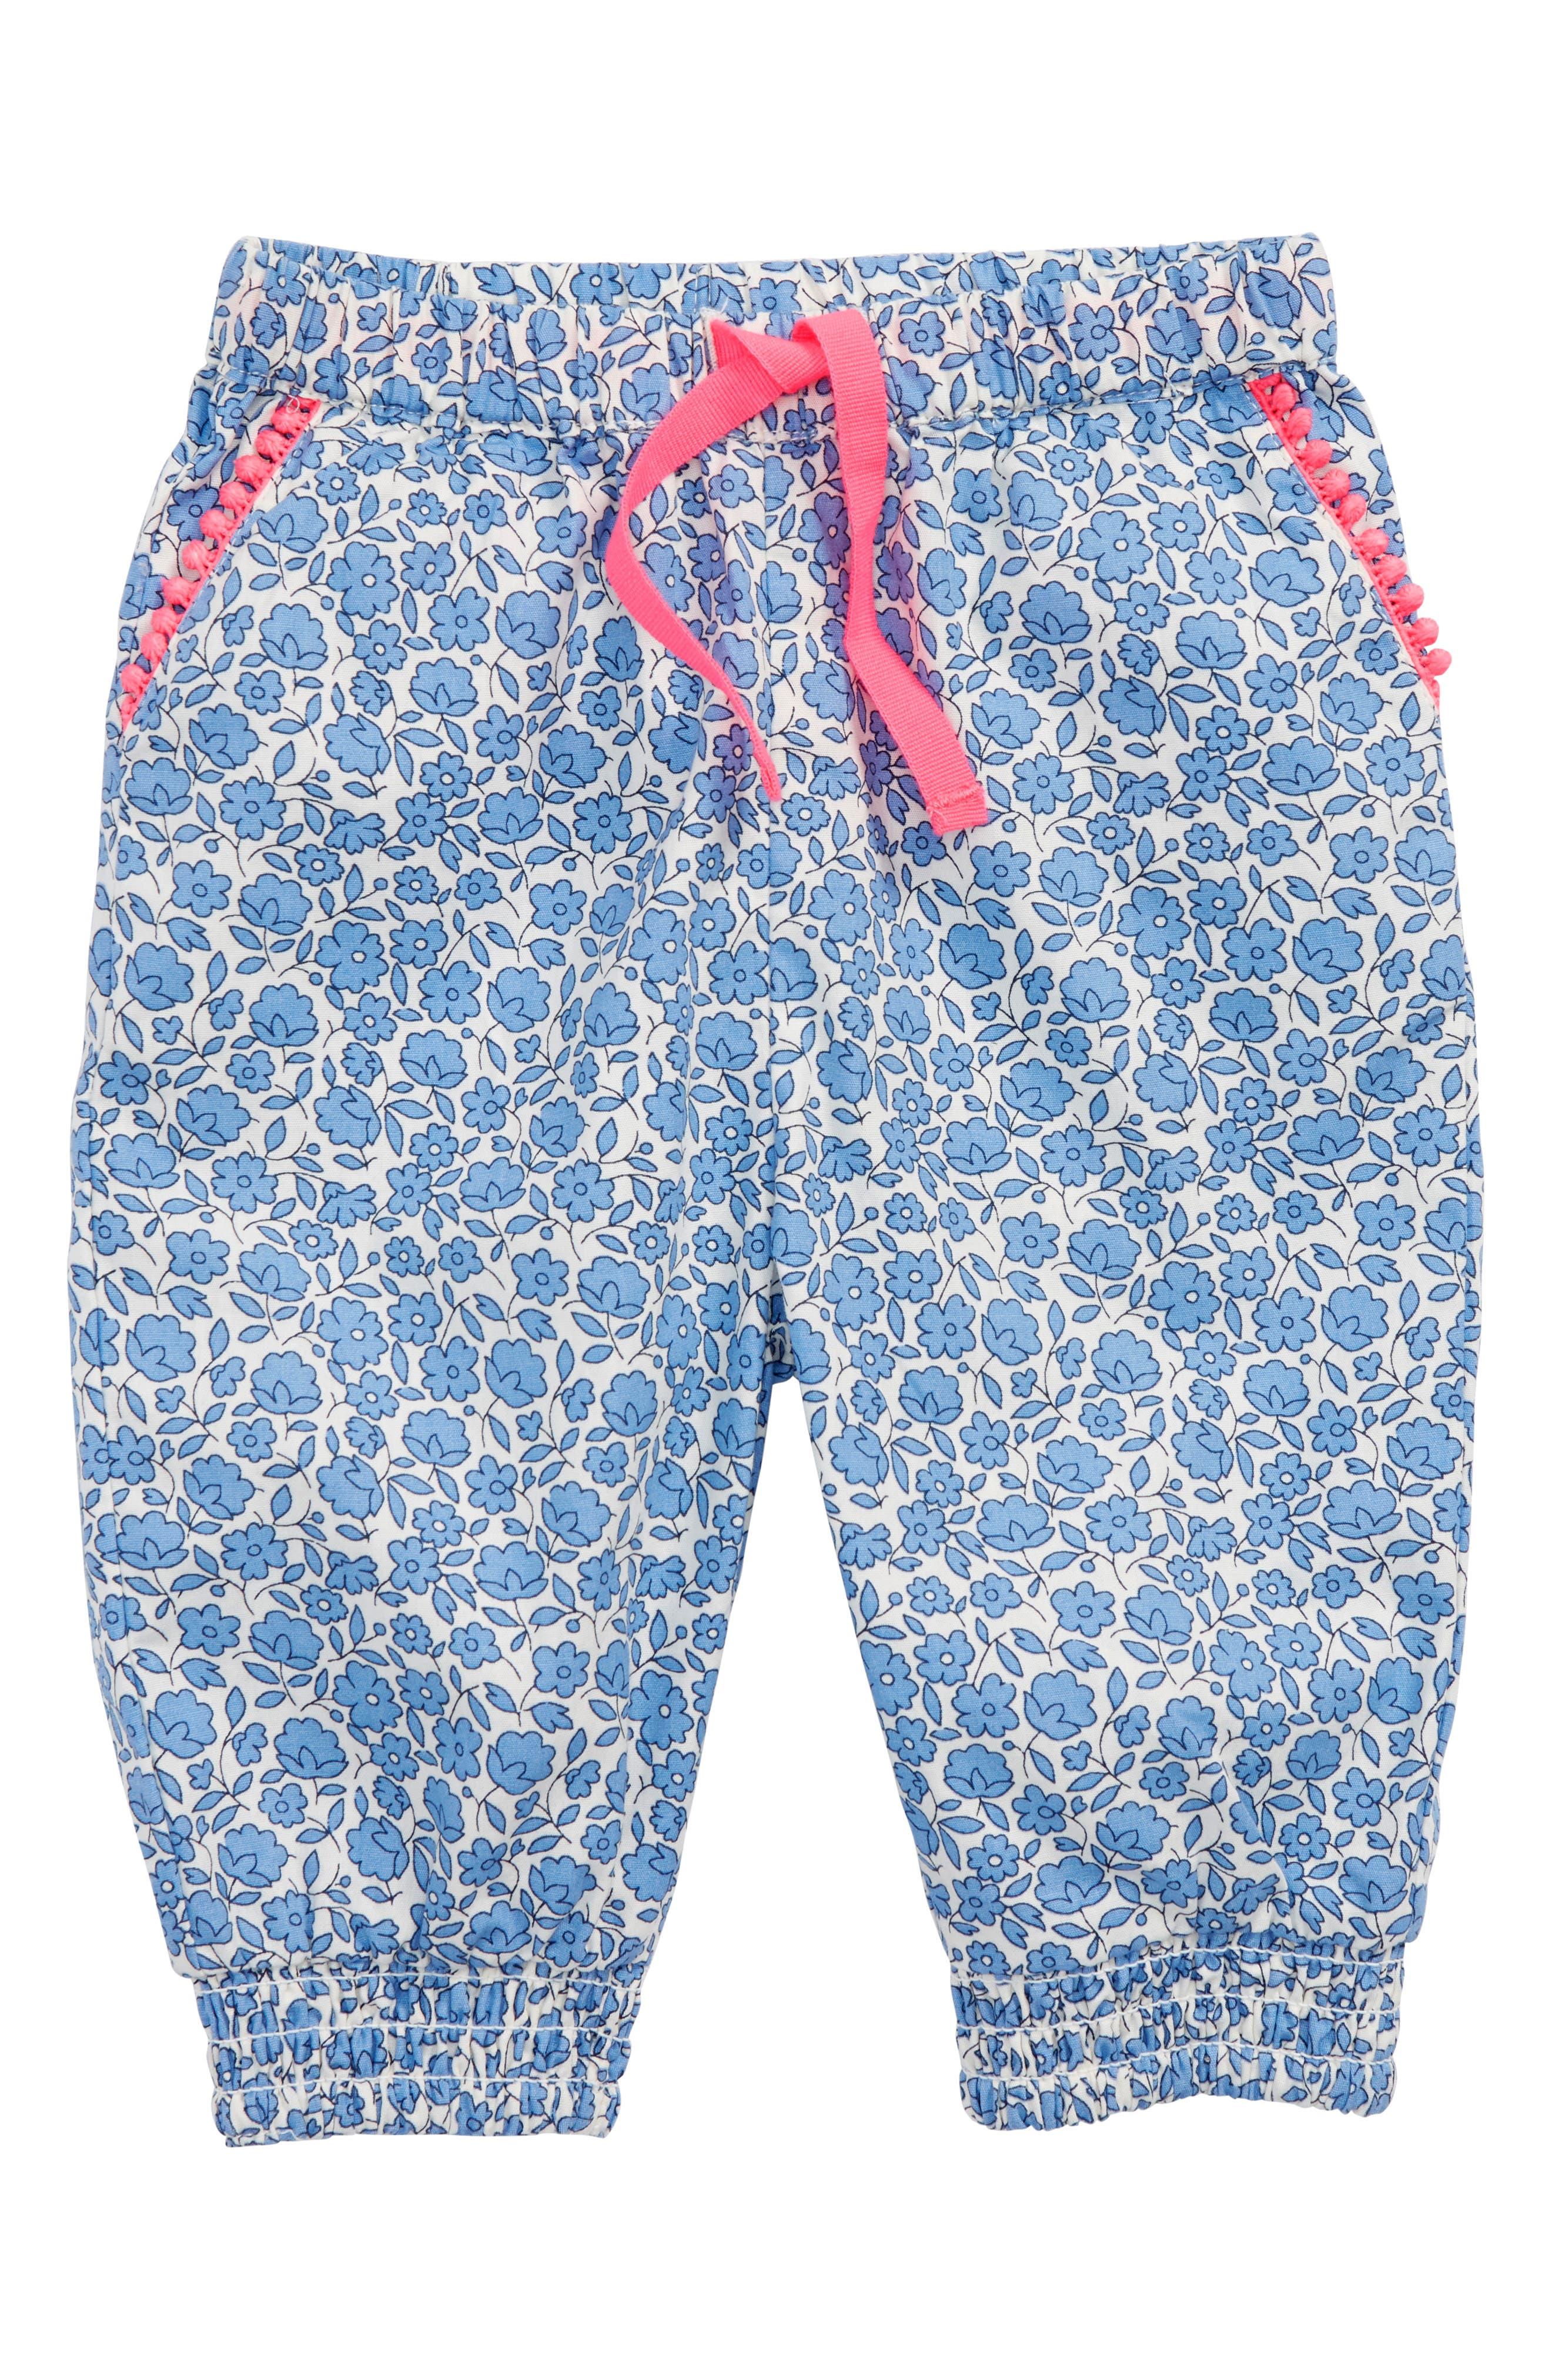 Alternate Image 1 Selected - Mini Boden Summer Floral Pants (Baby Girls & Toddler Girls)